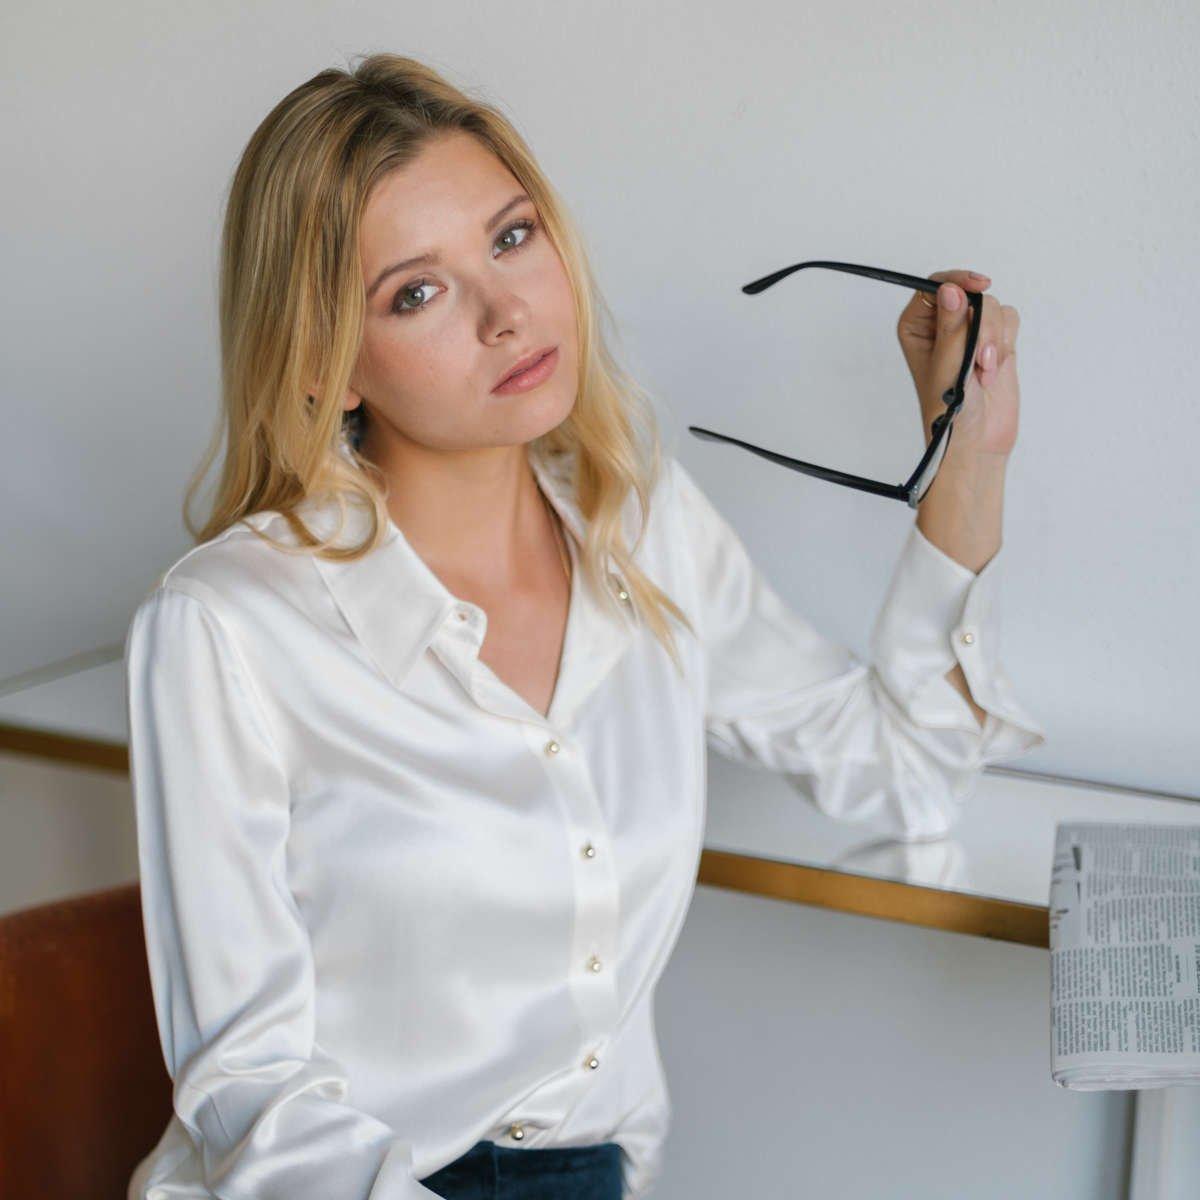 Ravella Silk Blouse - Perfect Coverage